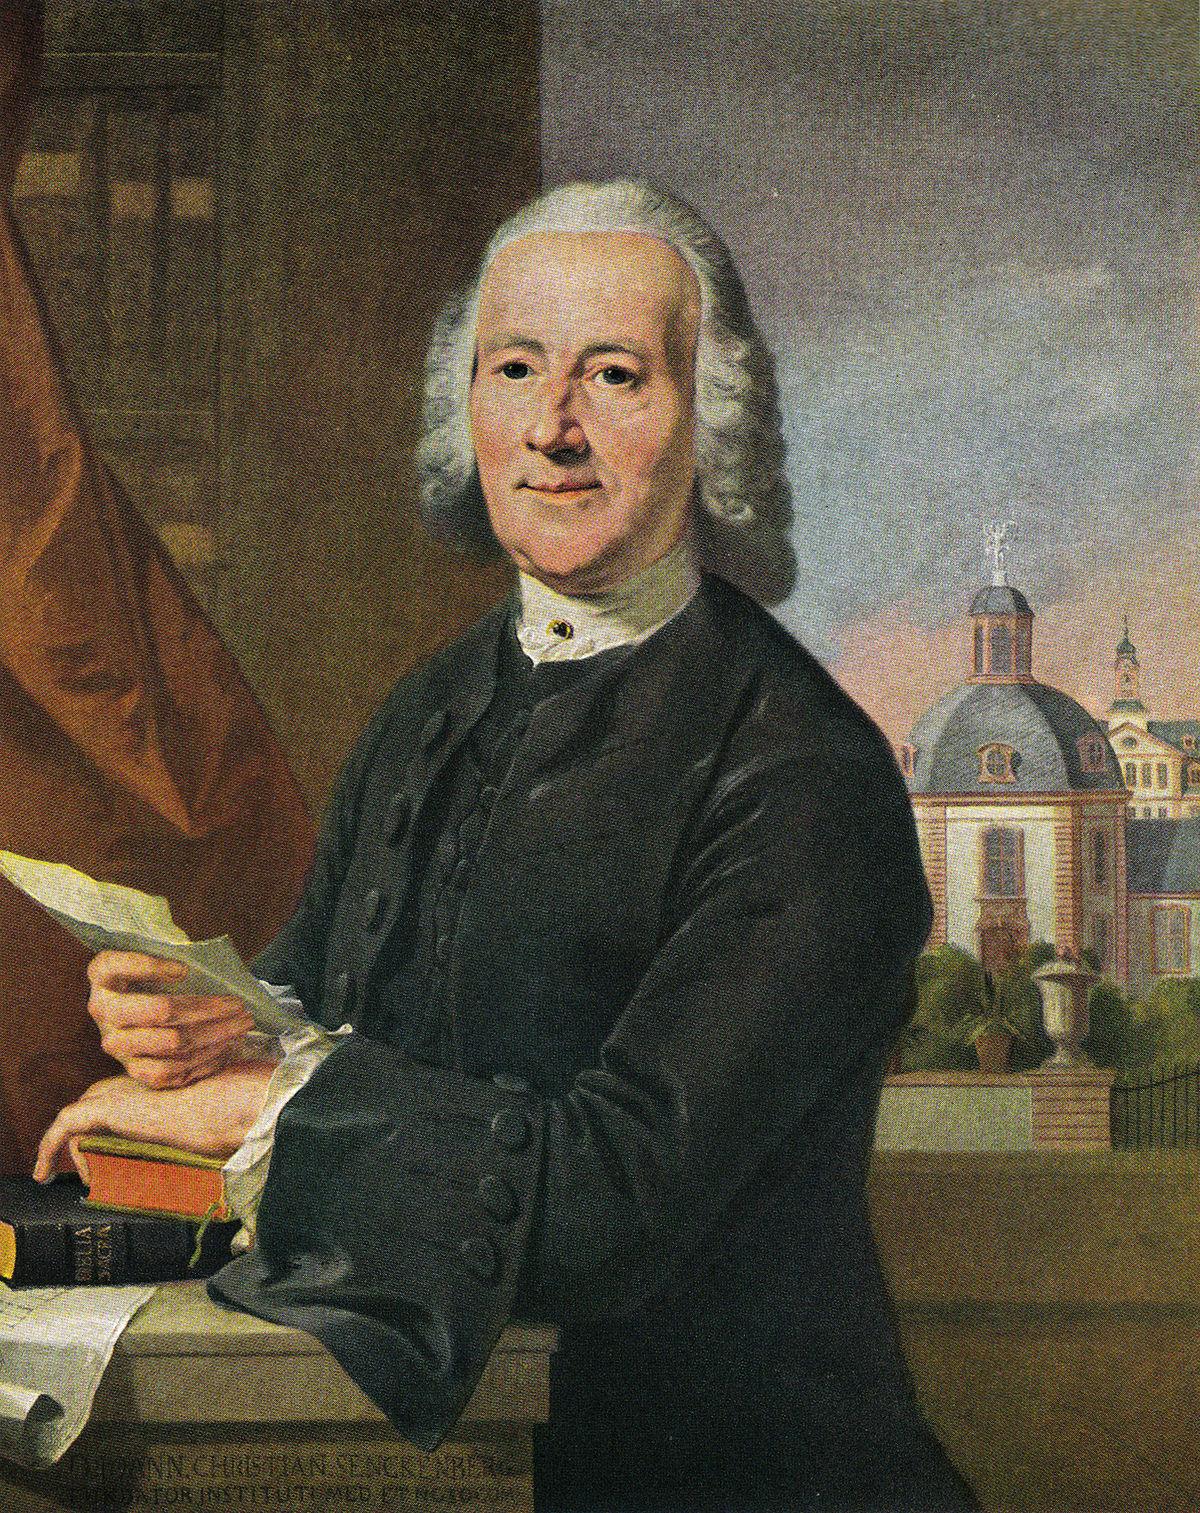 Johann Christian Senckenberg